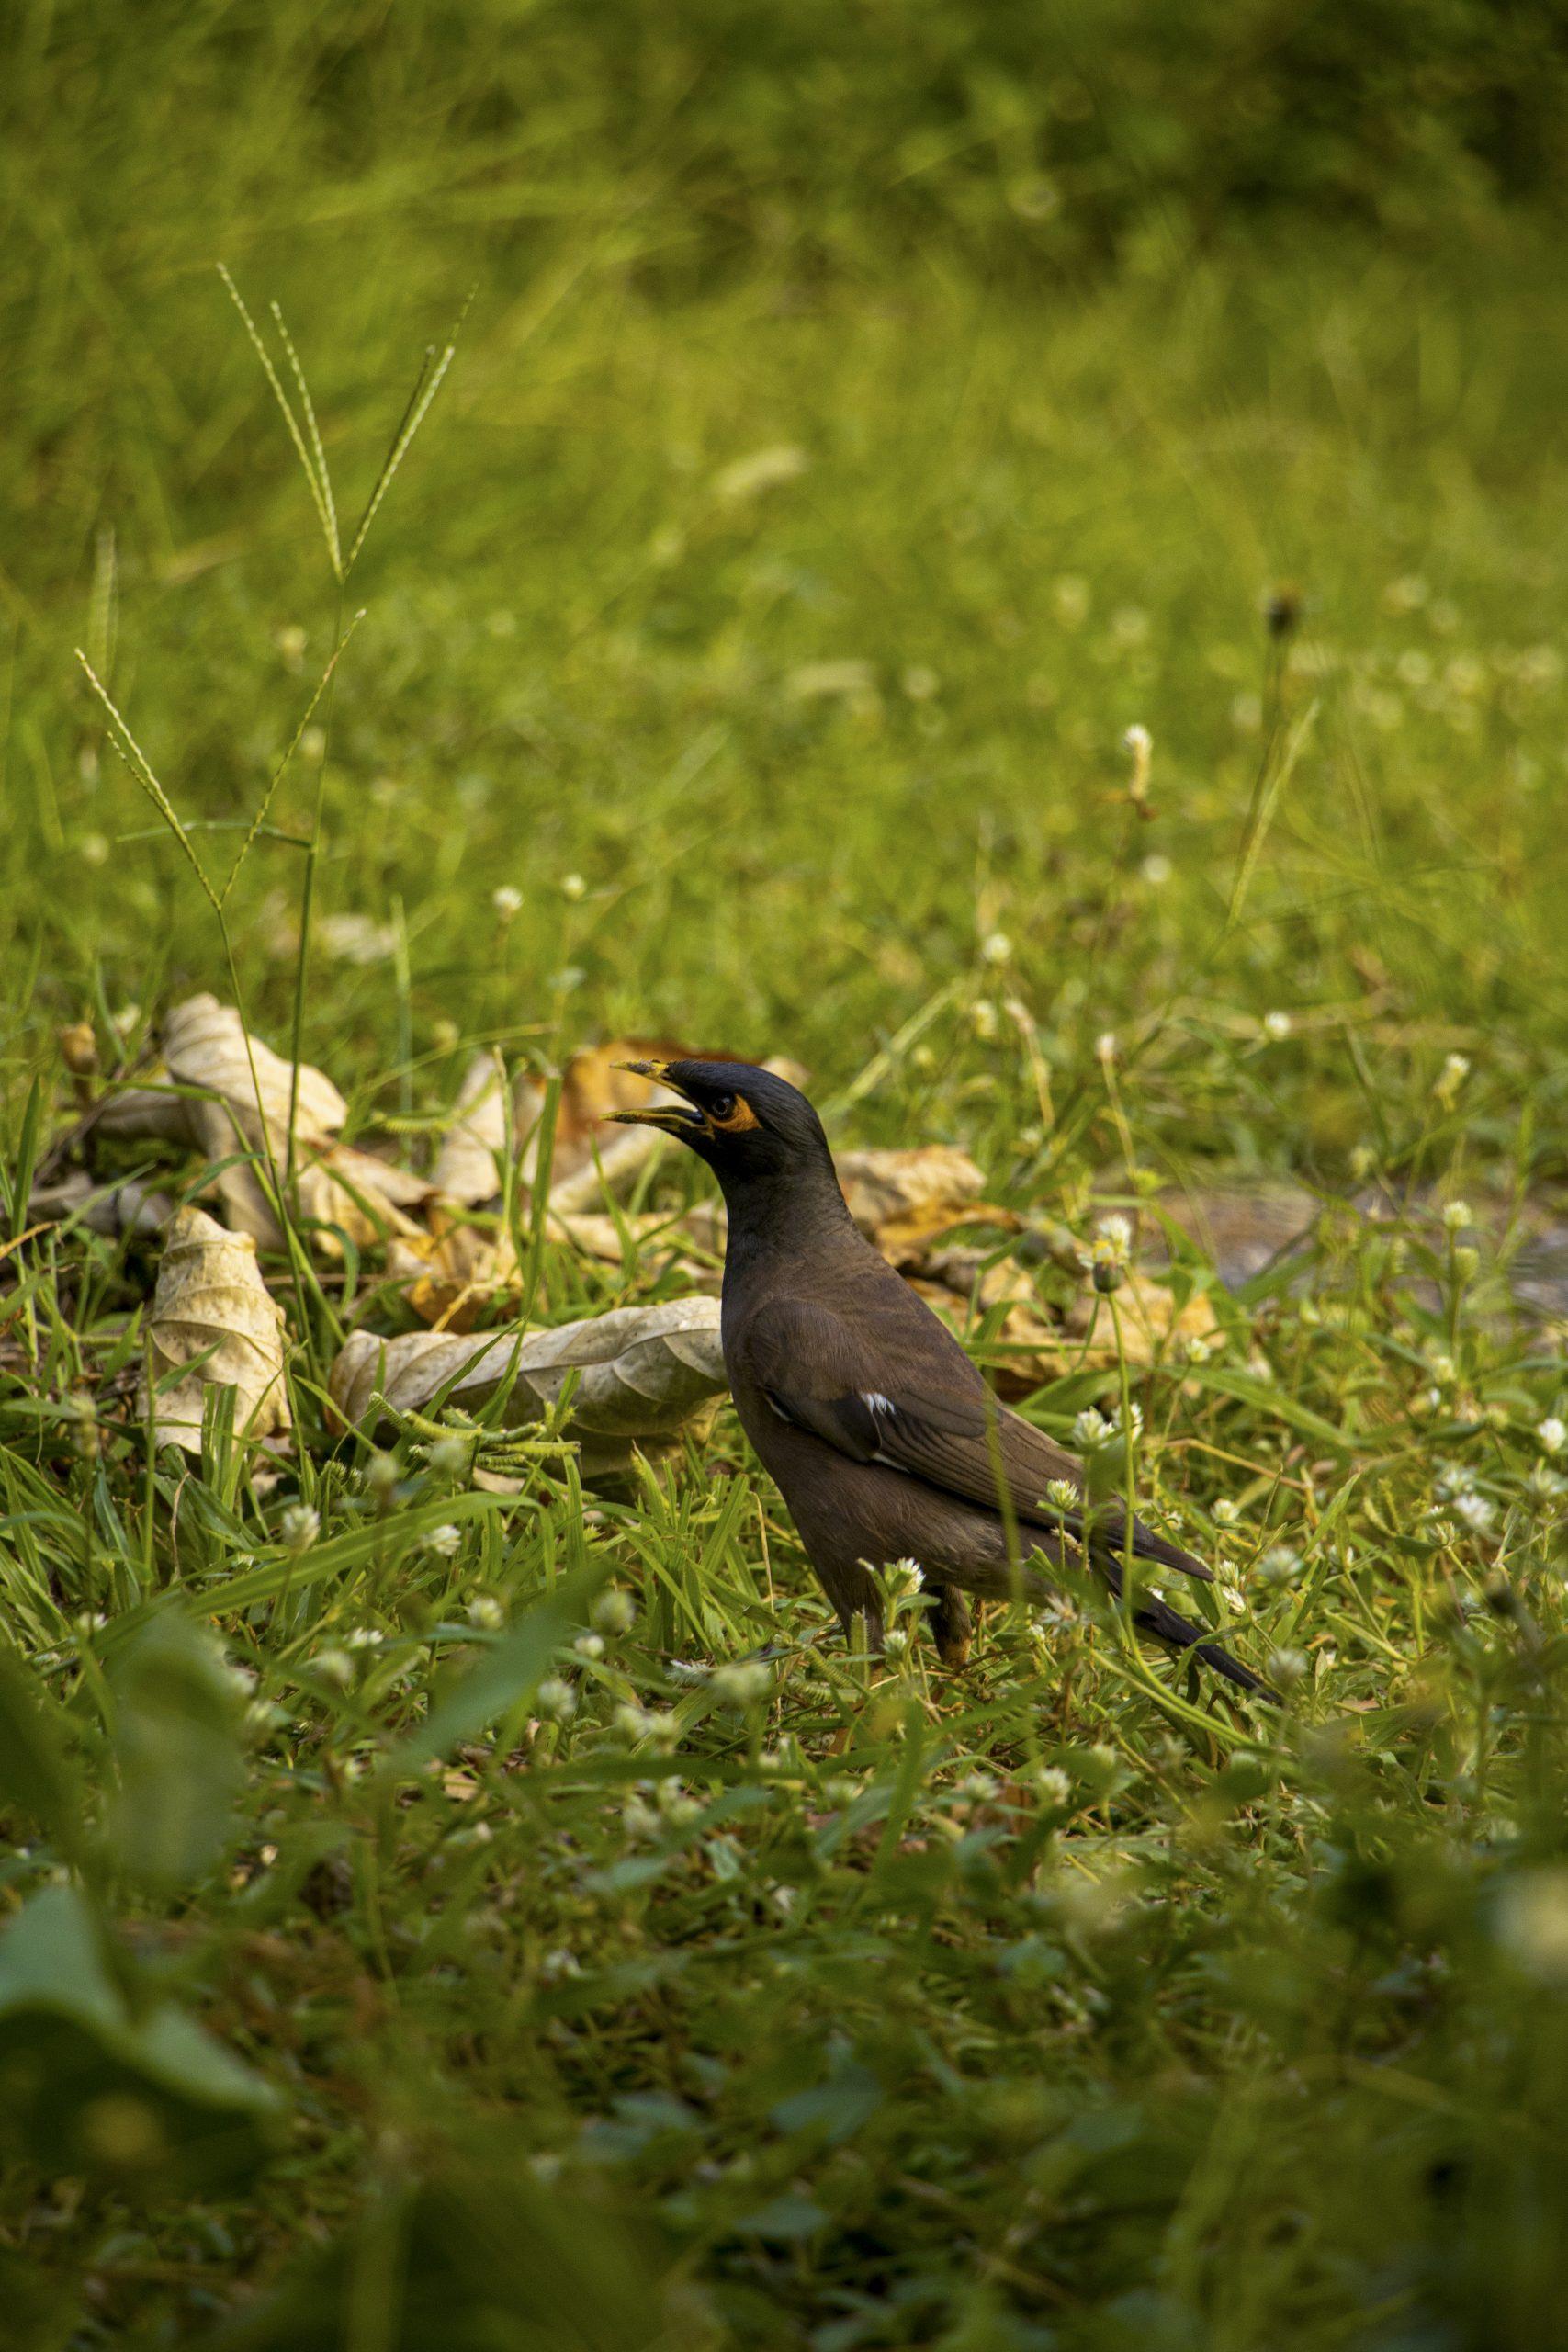 A black bird on the ground.